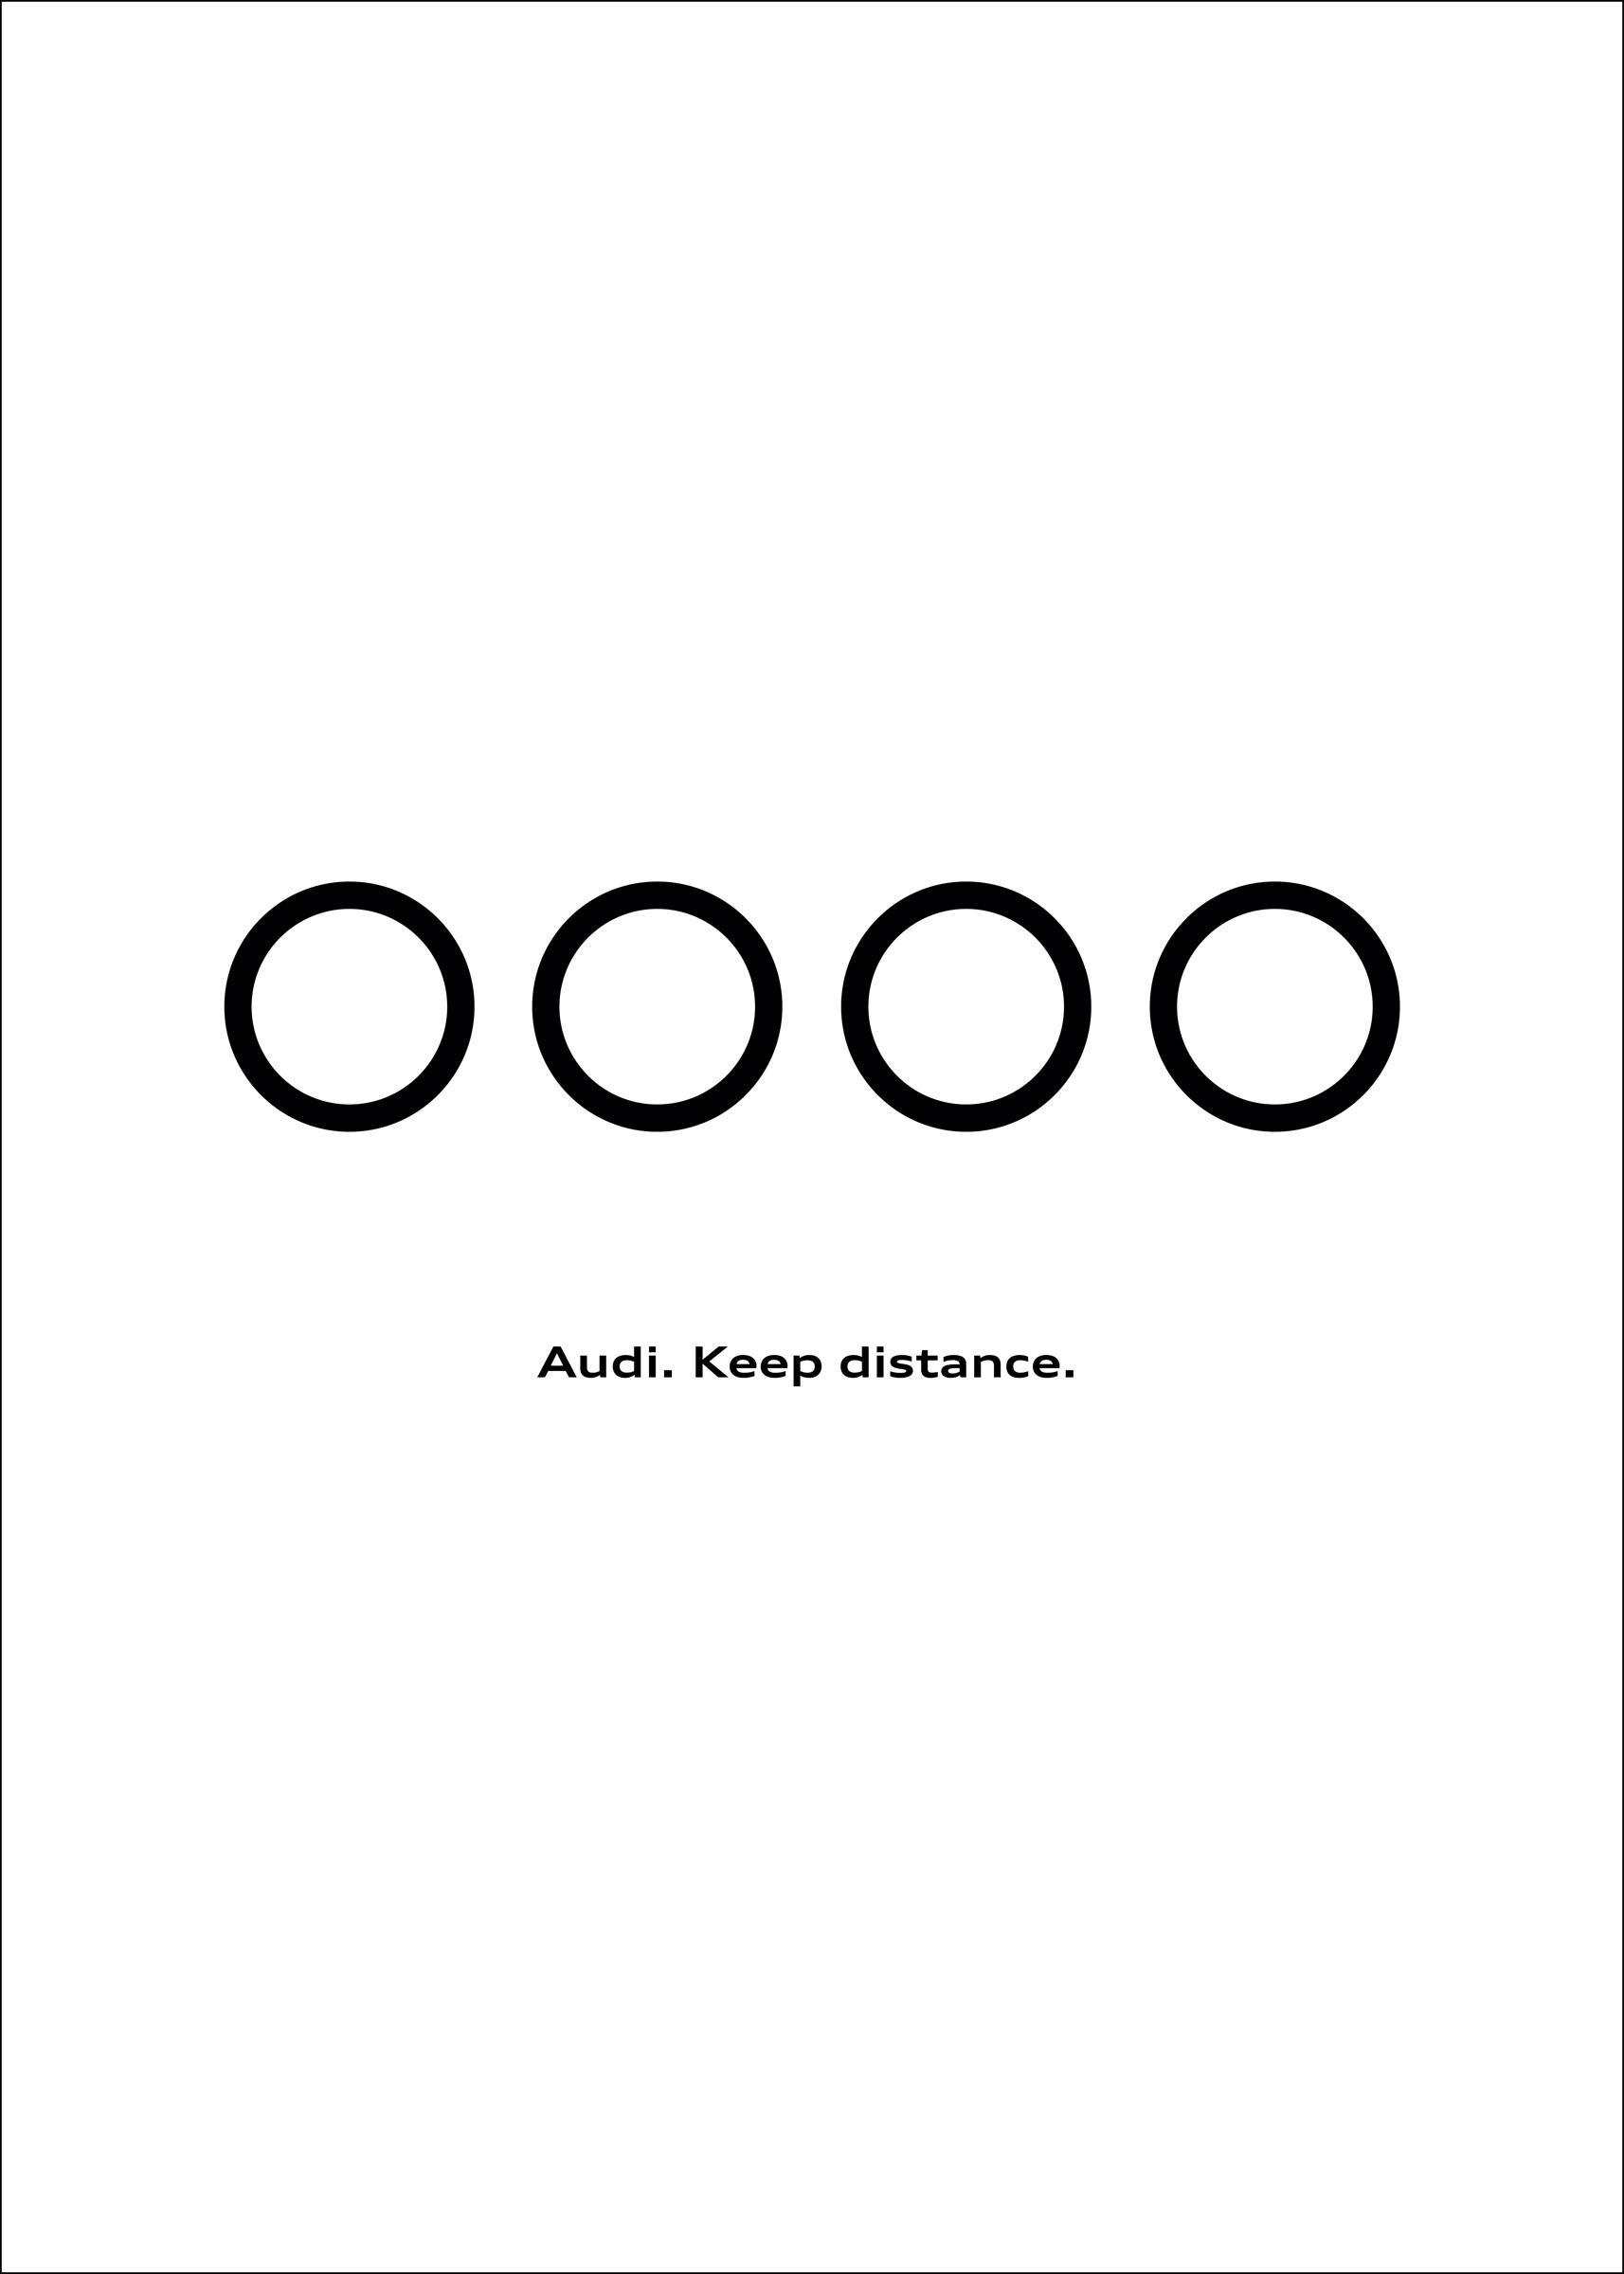 audi_keep_distance_resized.jpg